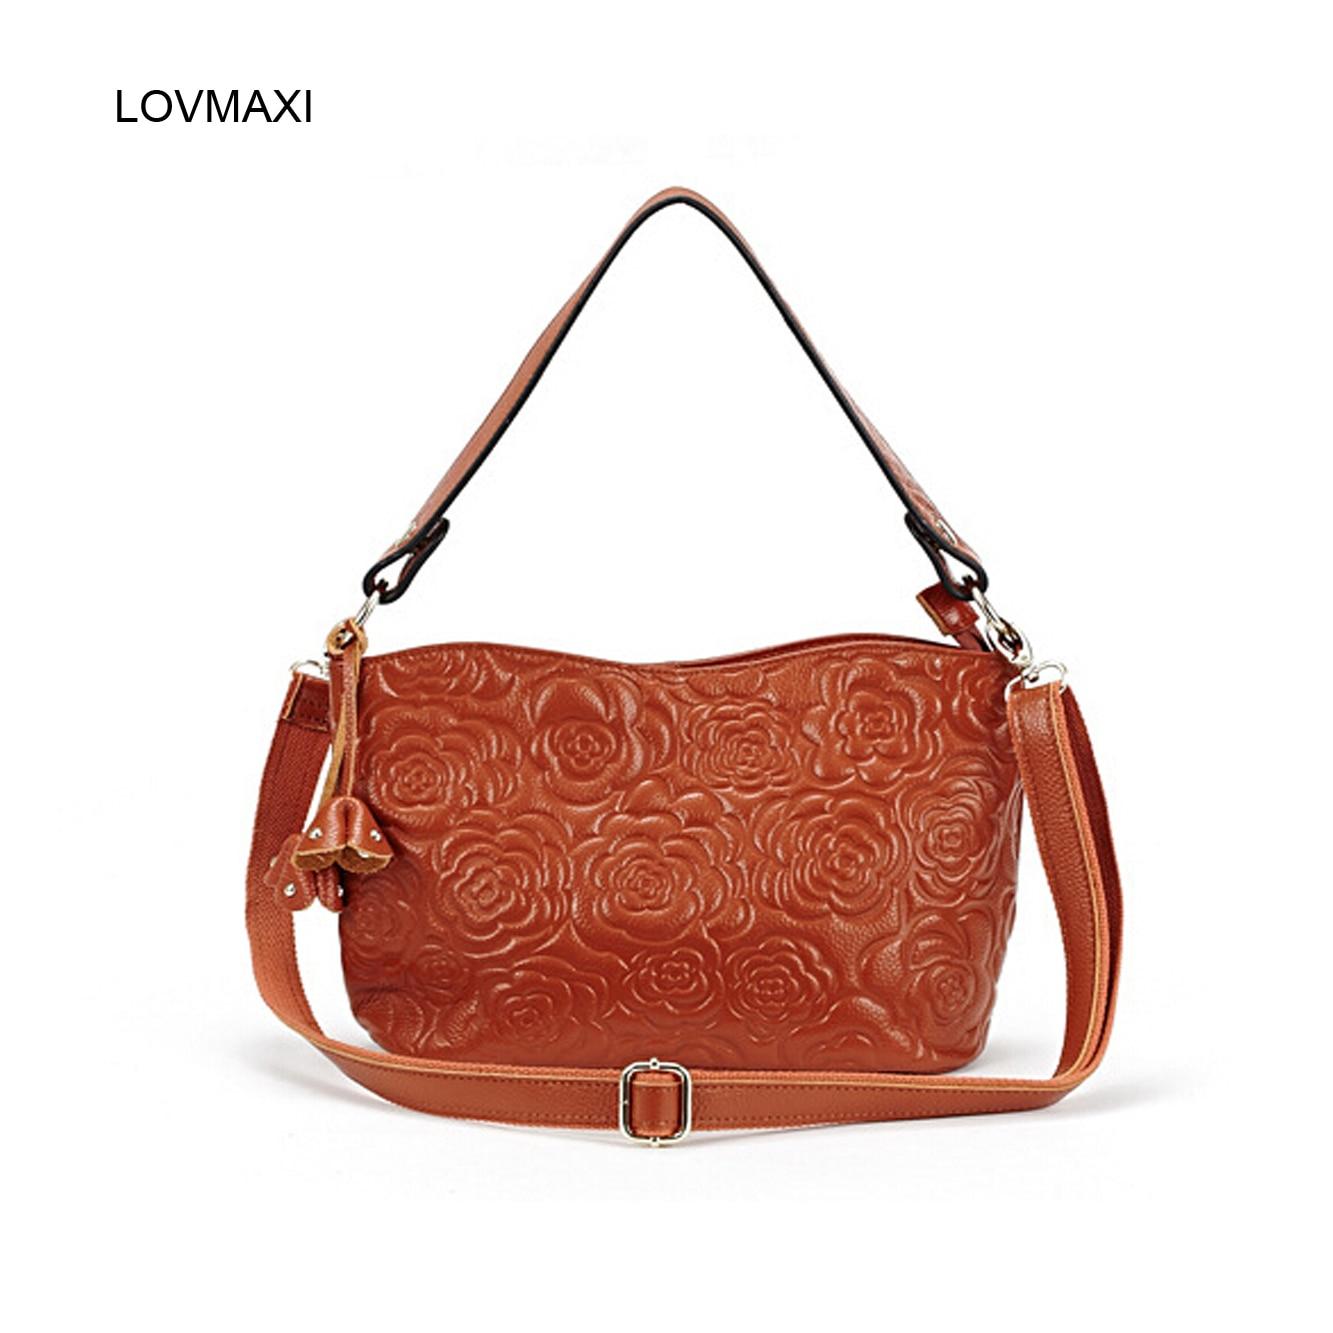 ФОТО LOVMAXI Guaranteed 100% Genuine Leather Women Bags Floral Embossed Ladies Handbag Lacquered Cross Body Bag Shoulder Tote Fashion